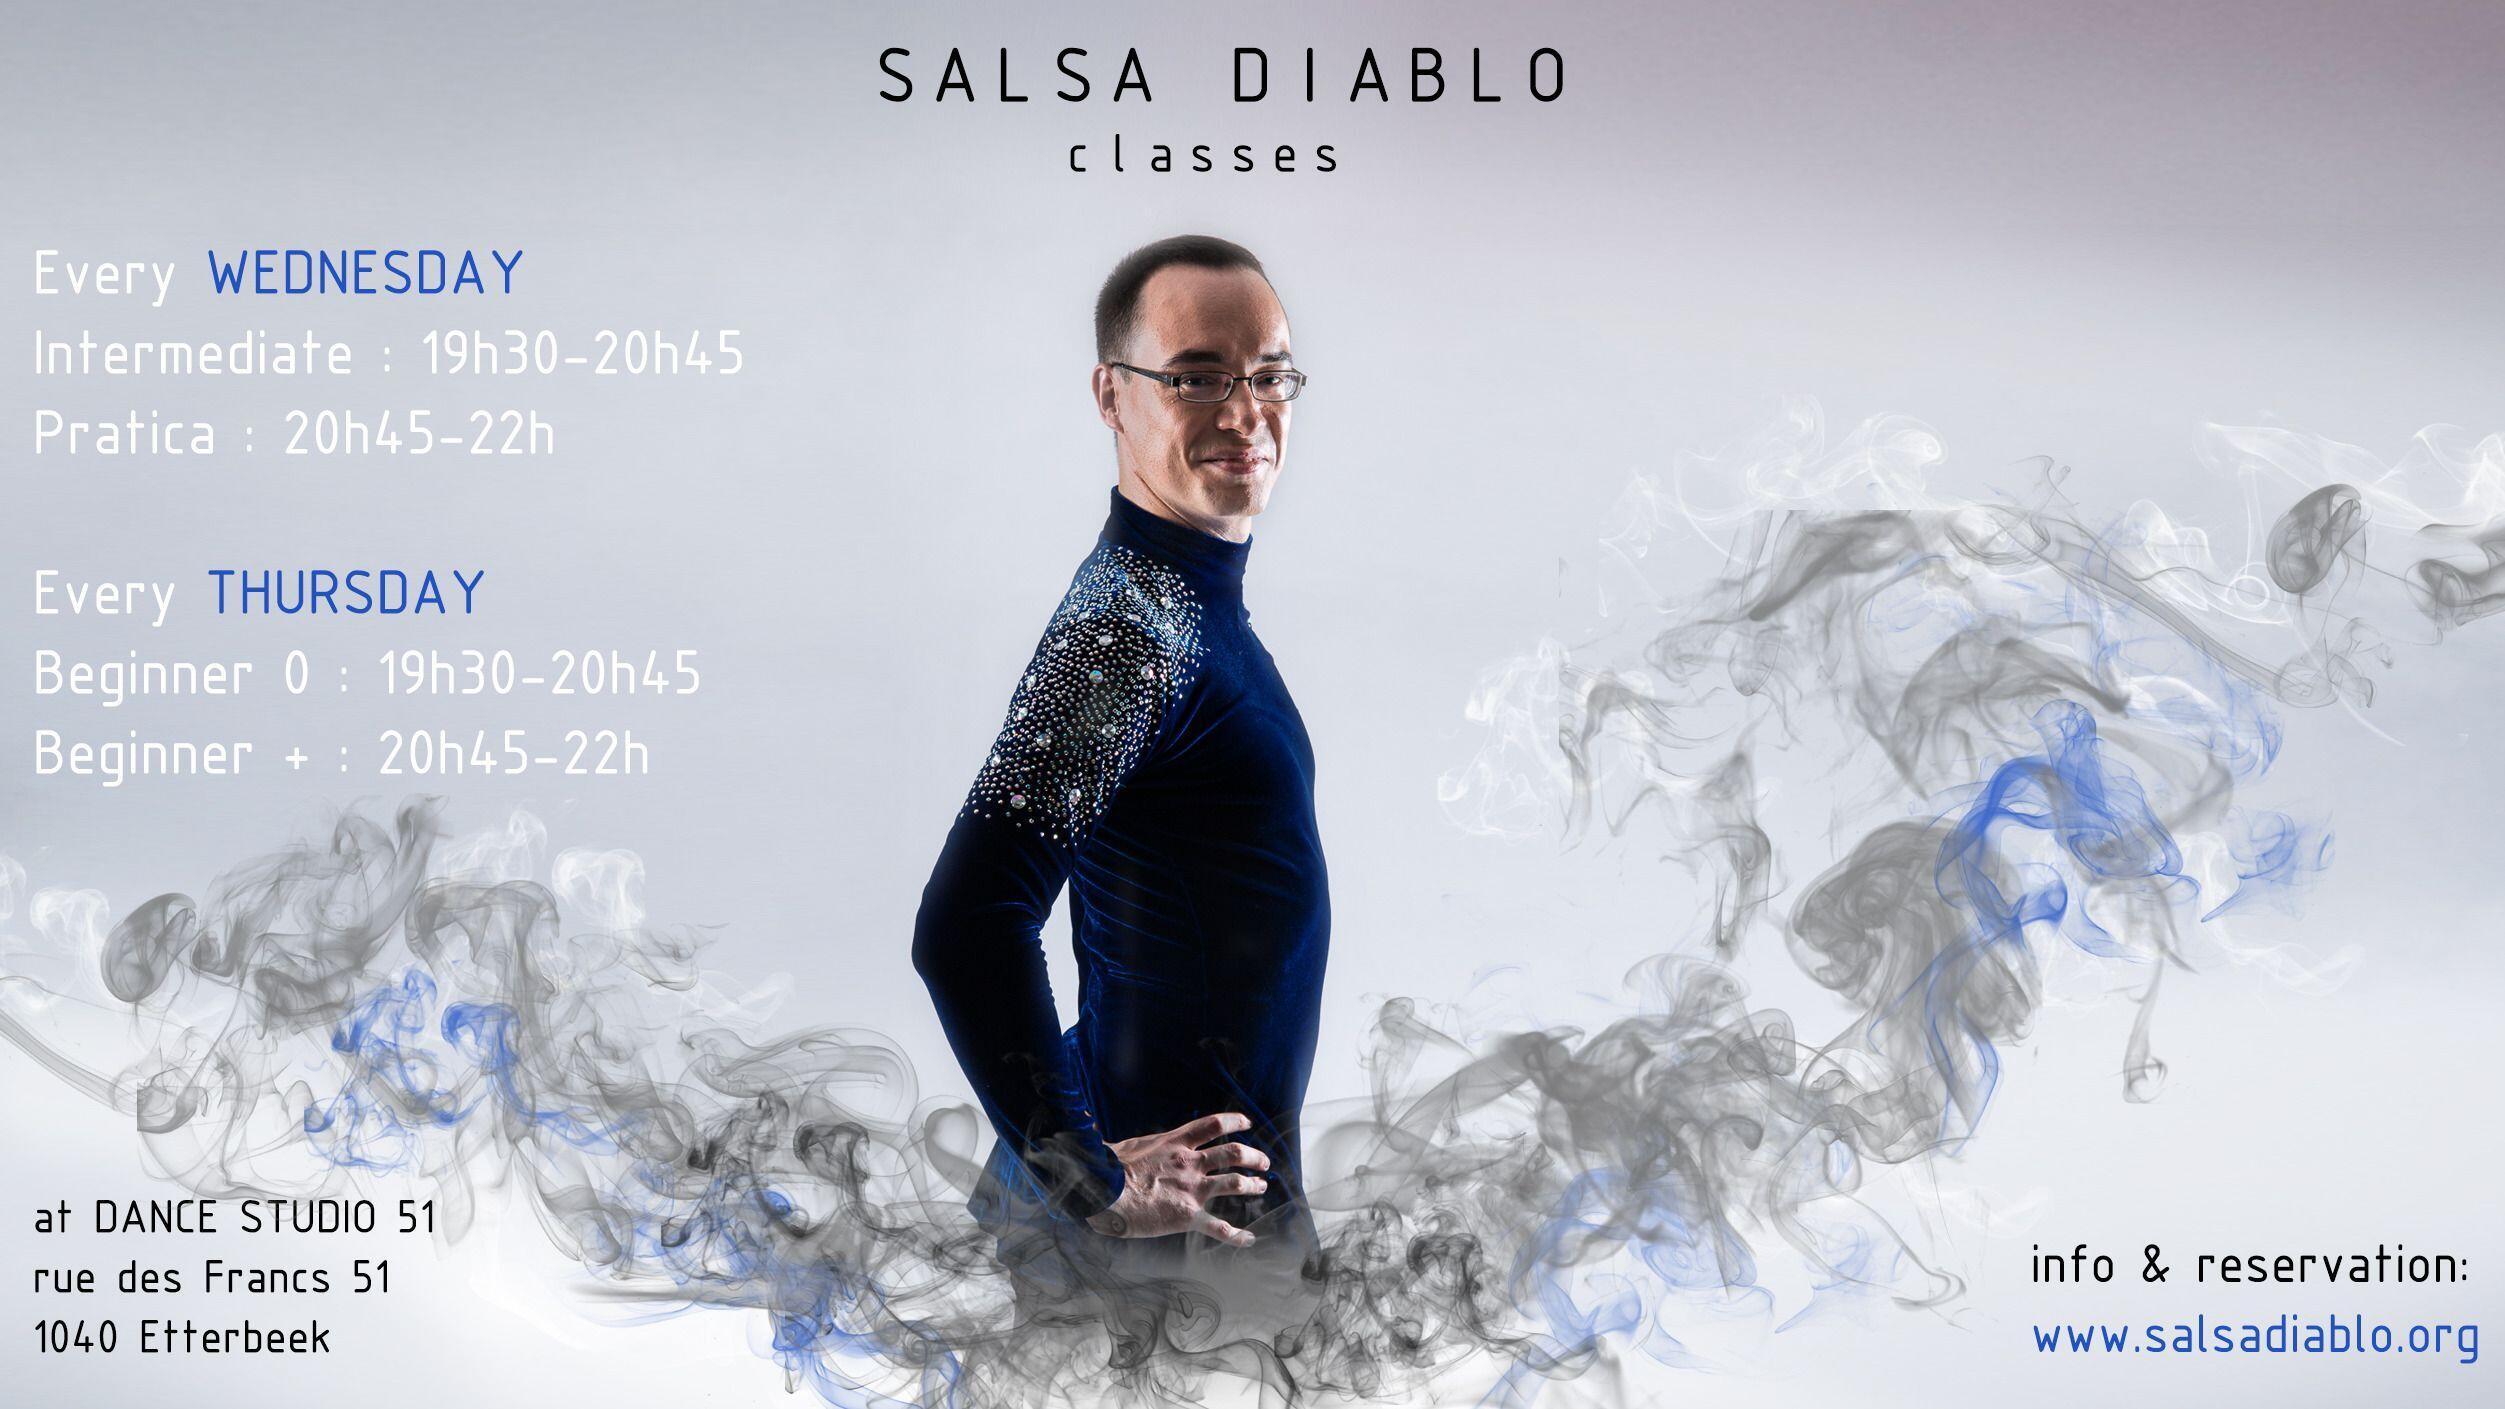 Let's Dance Salsa again ! - Intermediate level